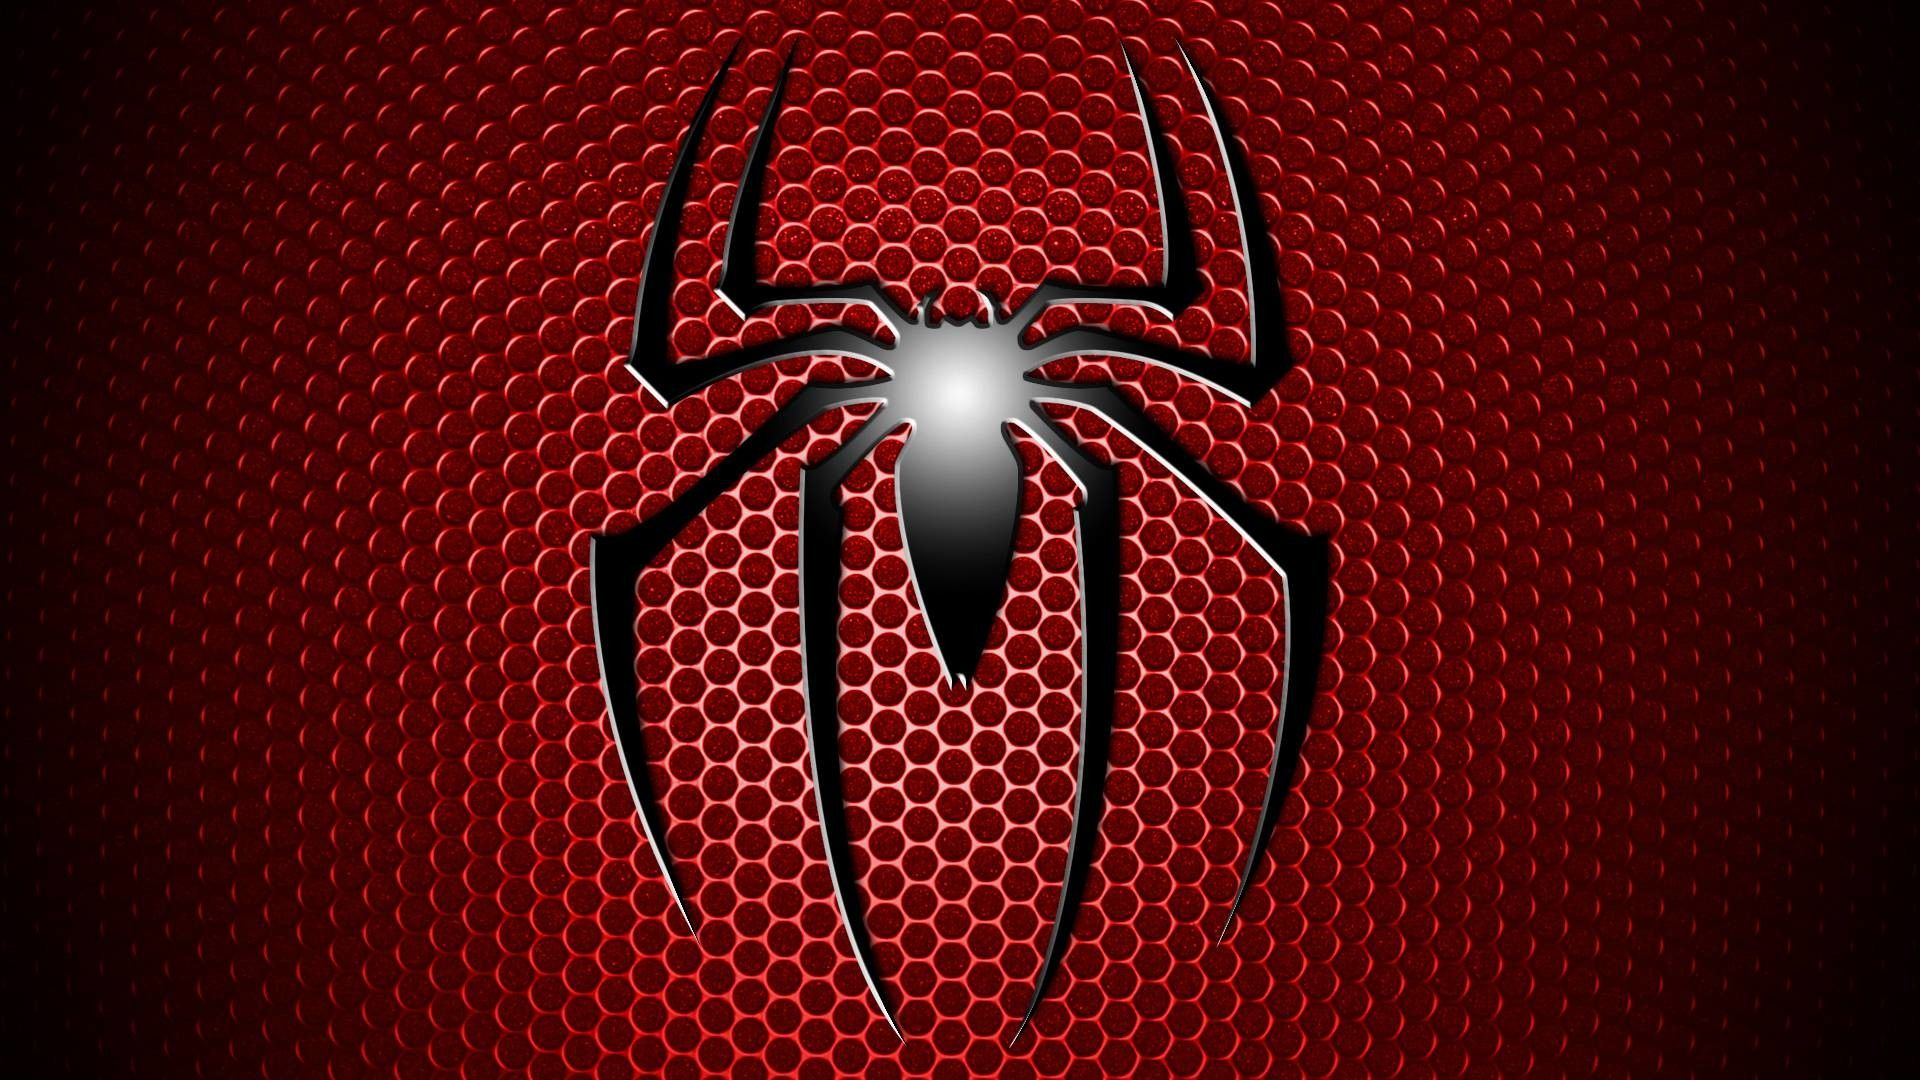 Spider Man Logo White Phone Wallpapers Top Free Spider Man